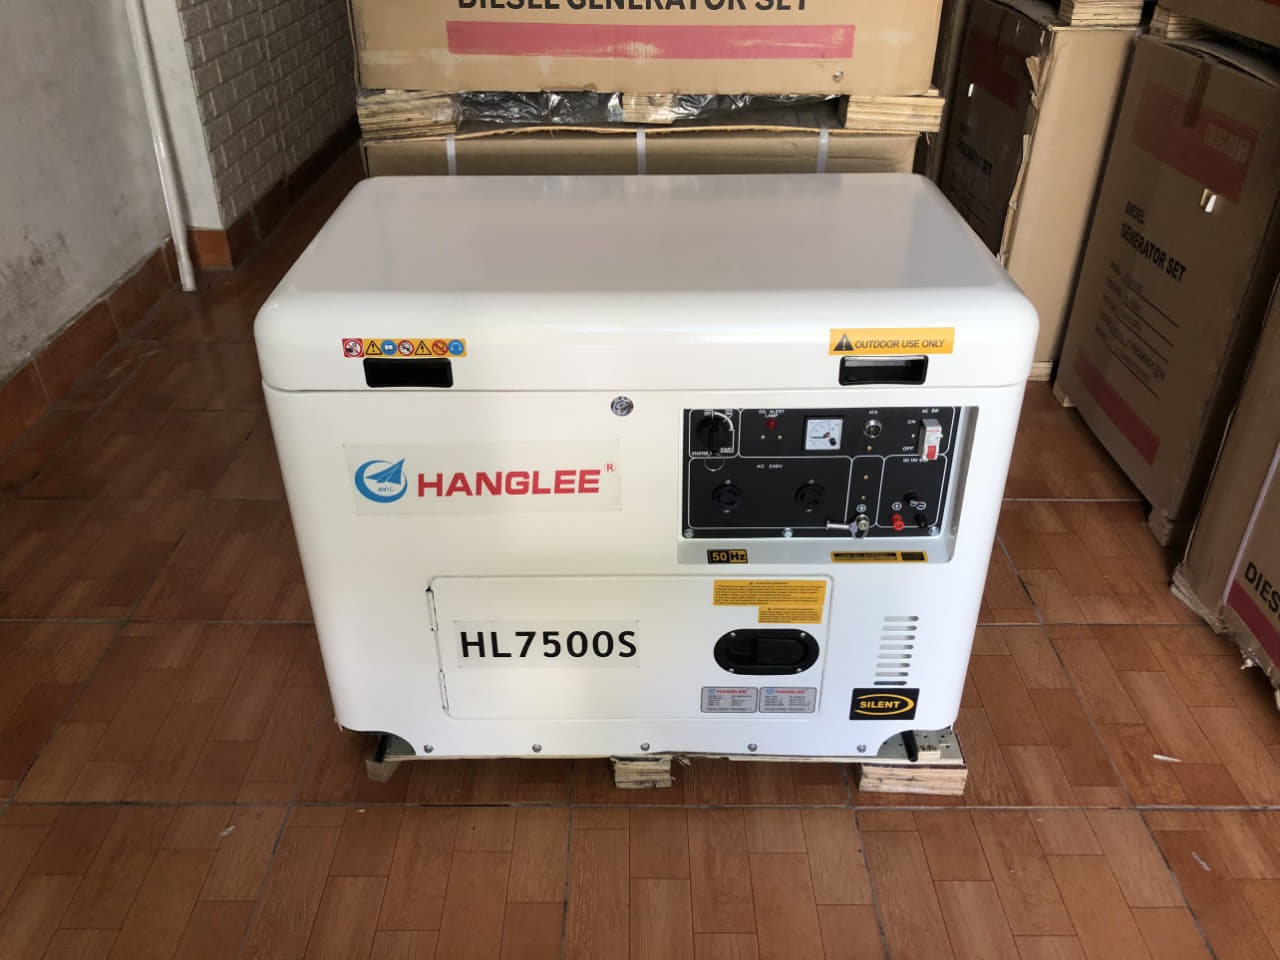 Hanglee HL7500S